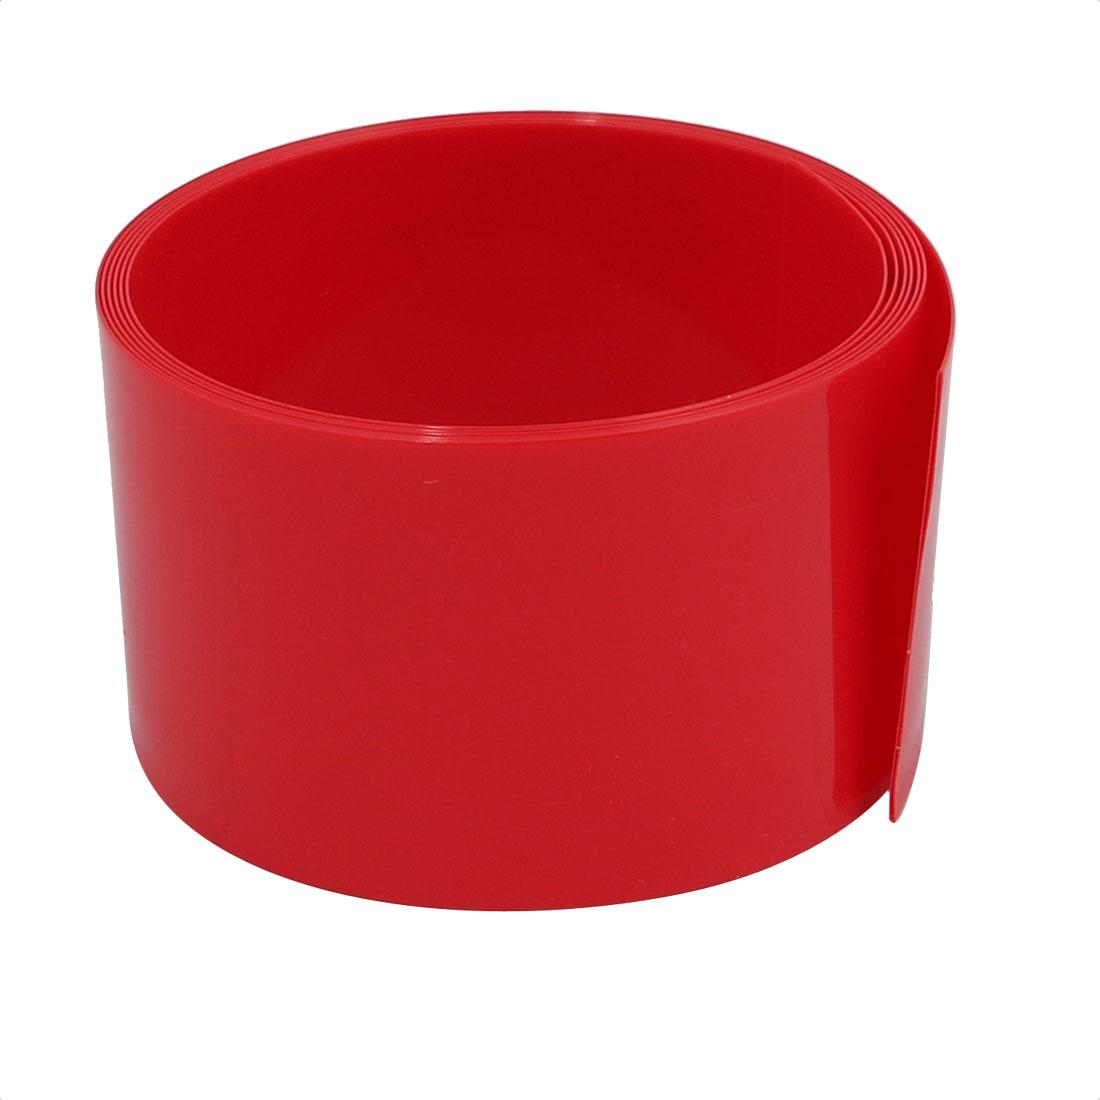 31mm Flat Width 1M Long PVC Heat Shrinkable Tube Red for Battery Pack